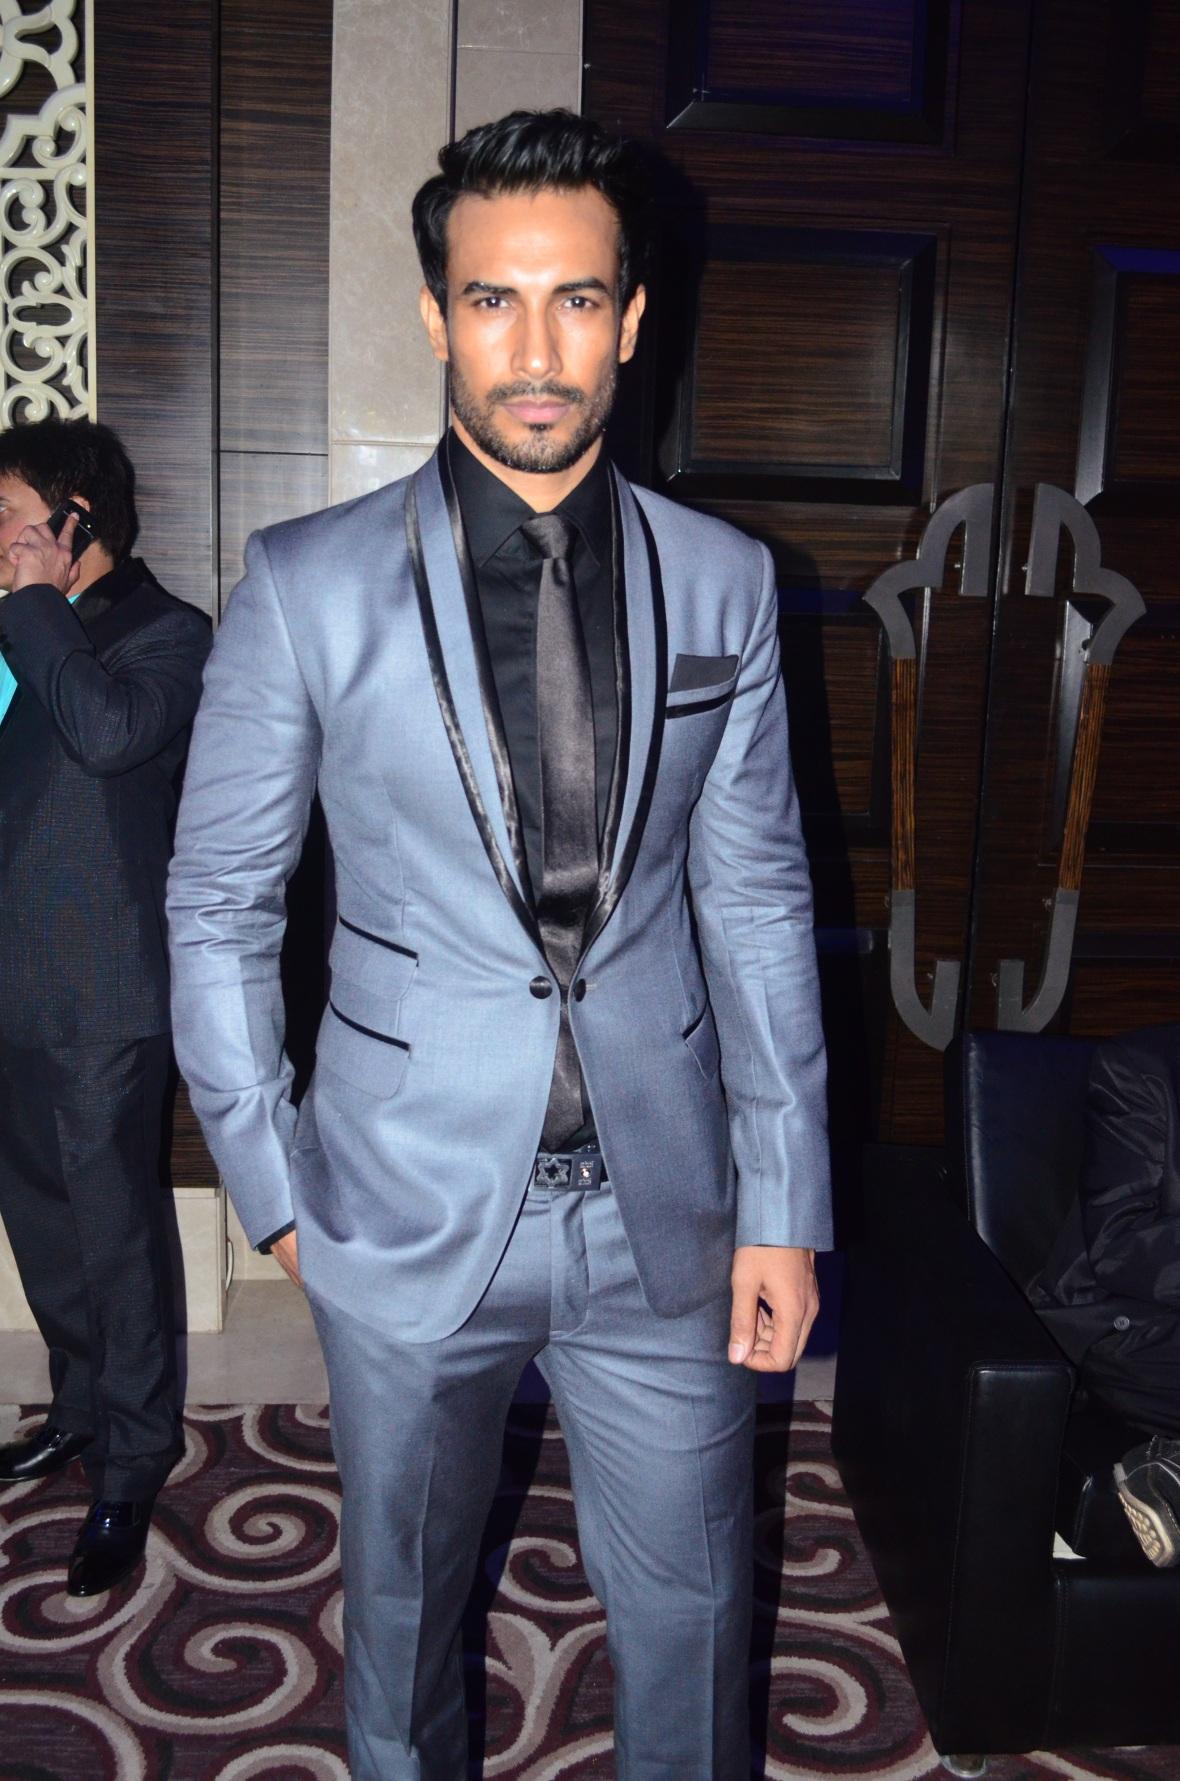 Model Asif Azim at the GQ Best Dressed Men 2014